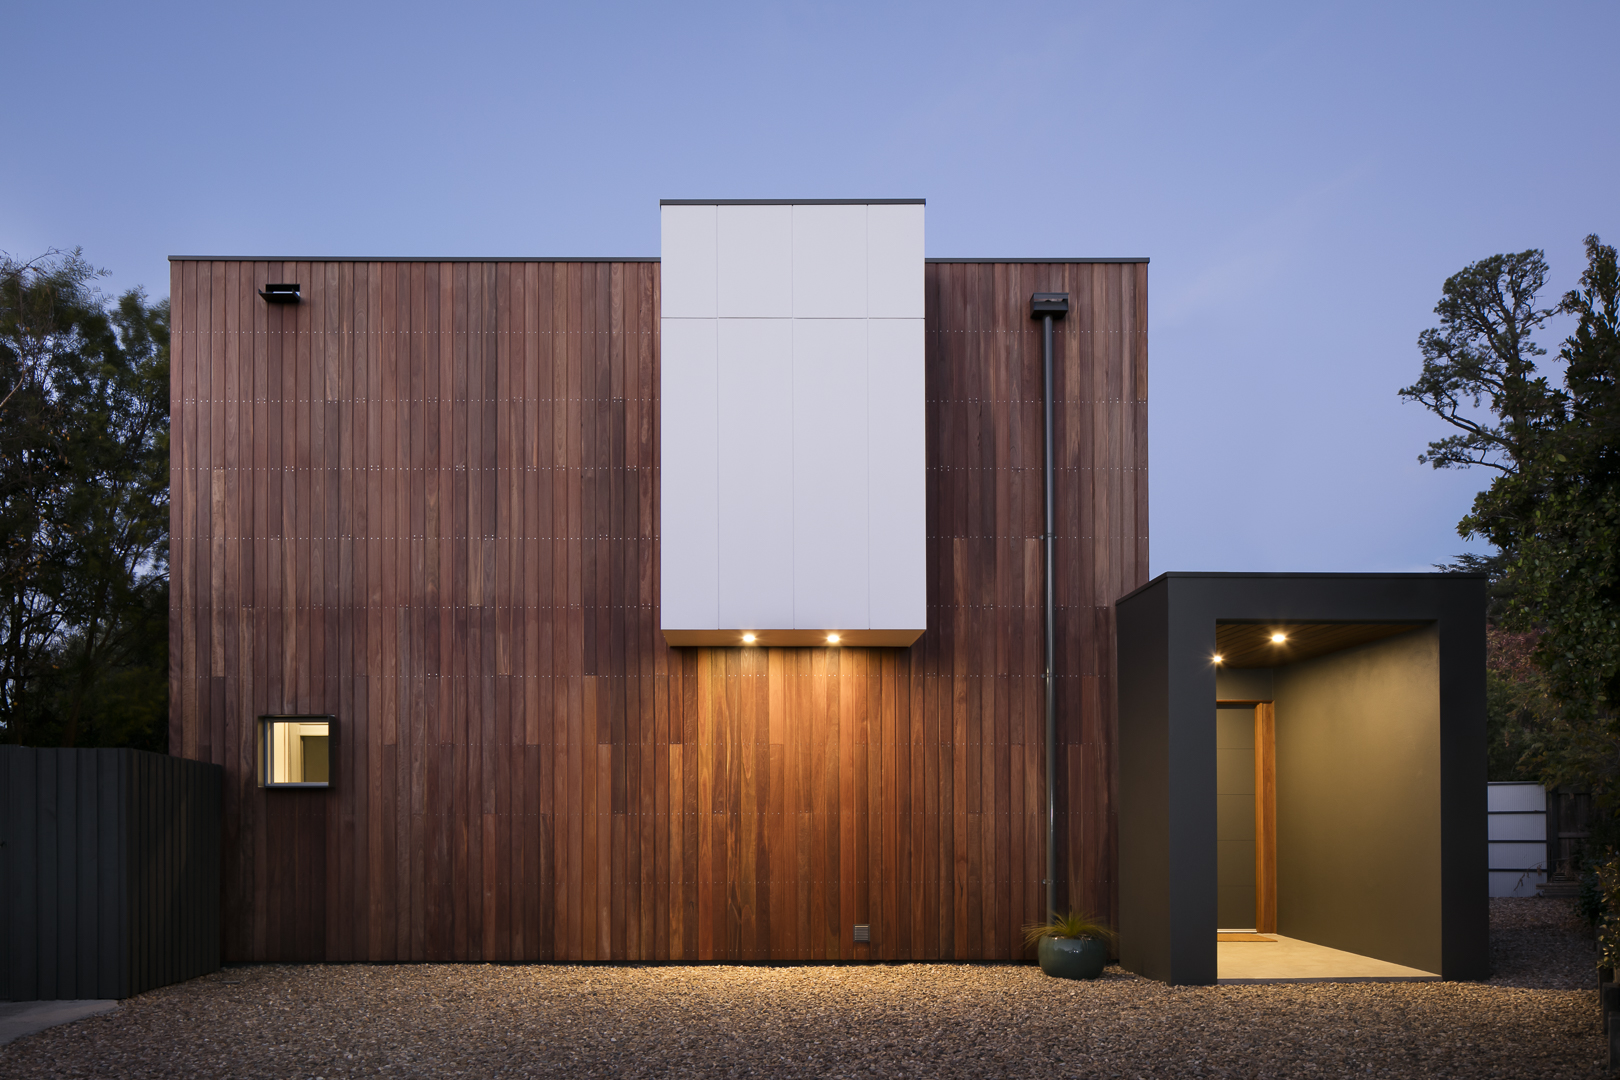 marina-mcdonald-architectural-photography-canberra-adam-hobill-design-exterior-timber-entrance